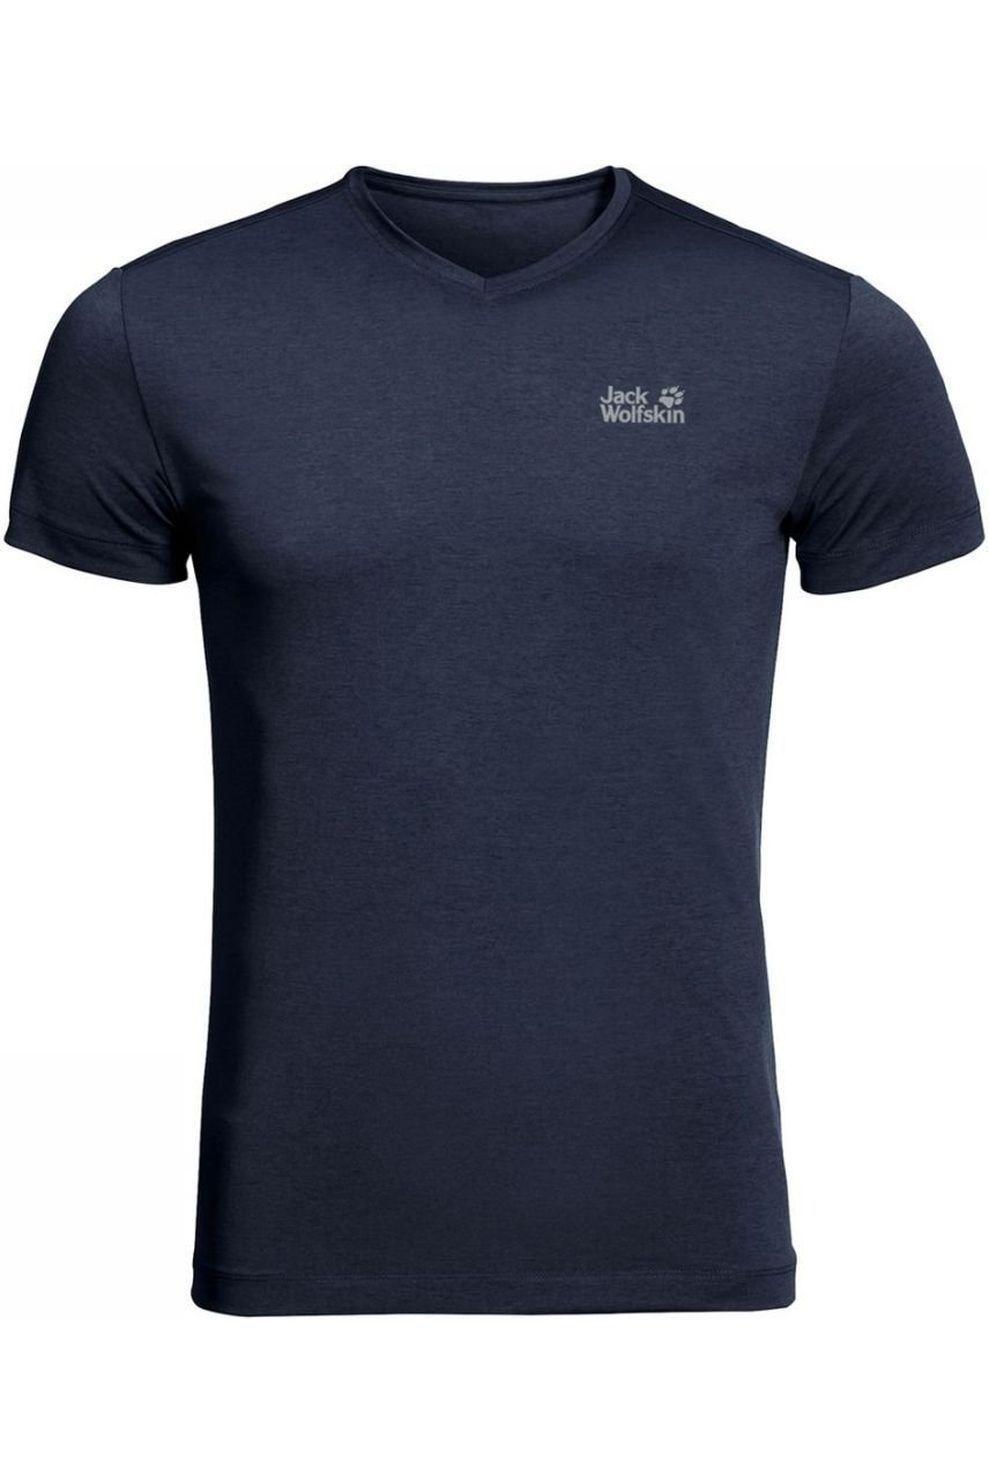 Jack Wolfskin T-shirt Jwp Pack And Go! voor heren Blauw Maten: M, L, XL, XXL